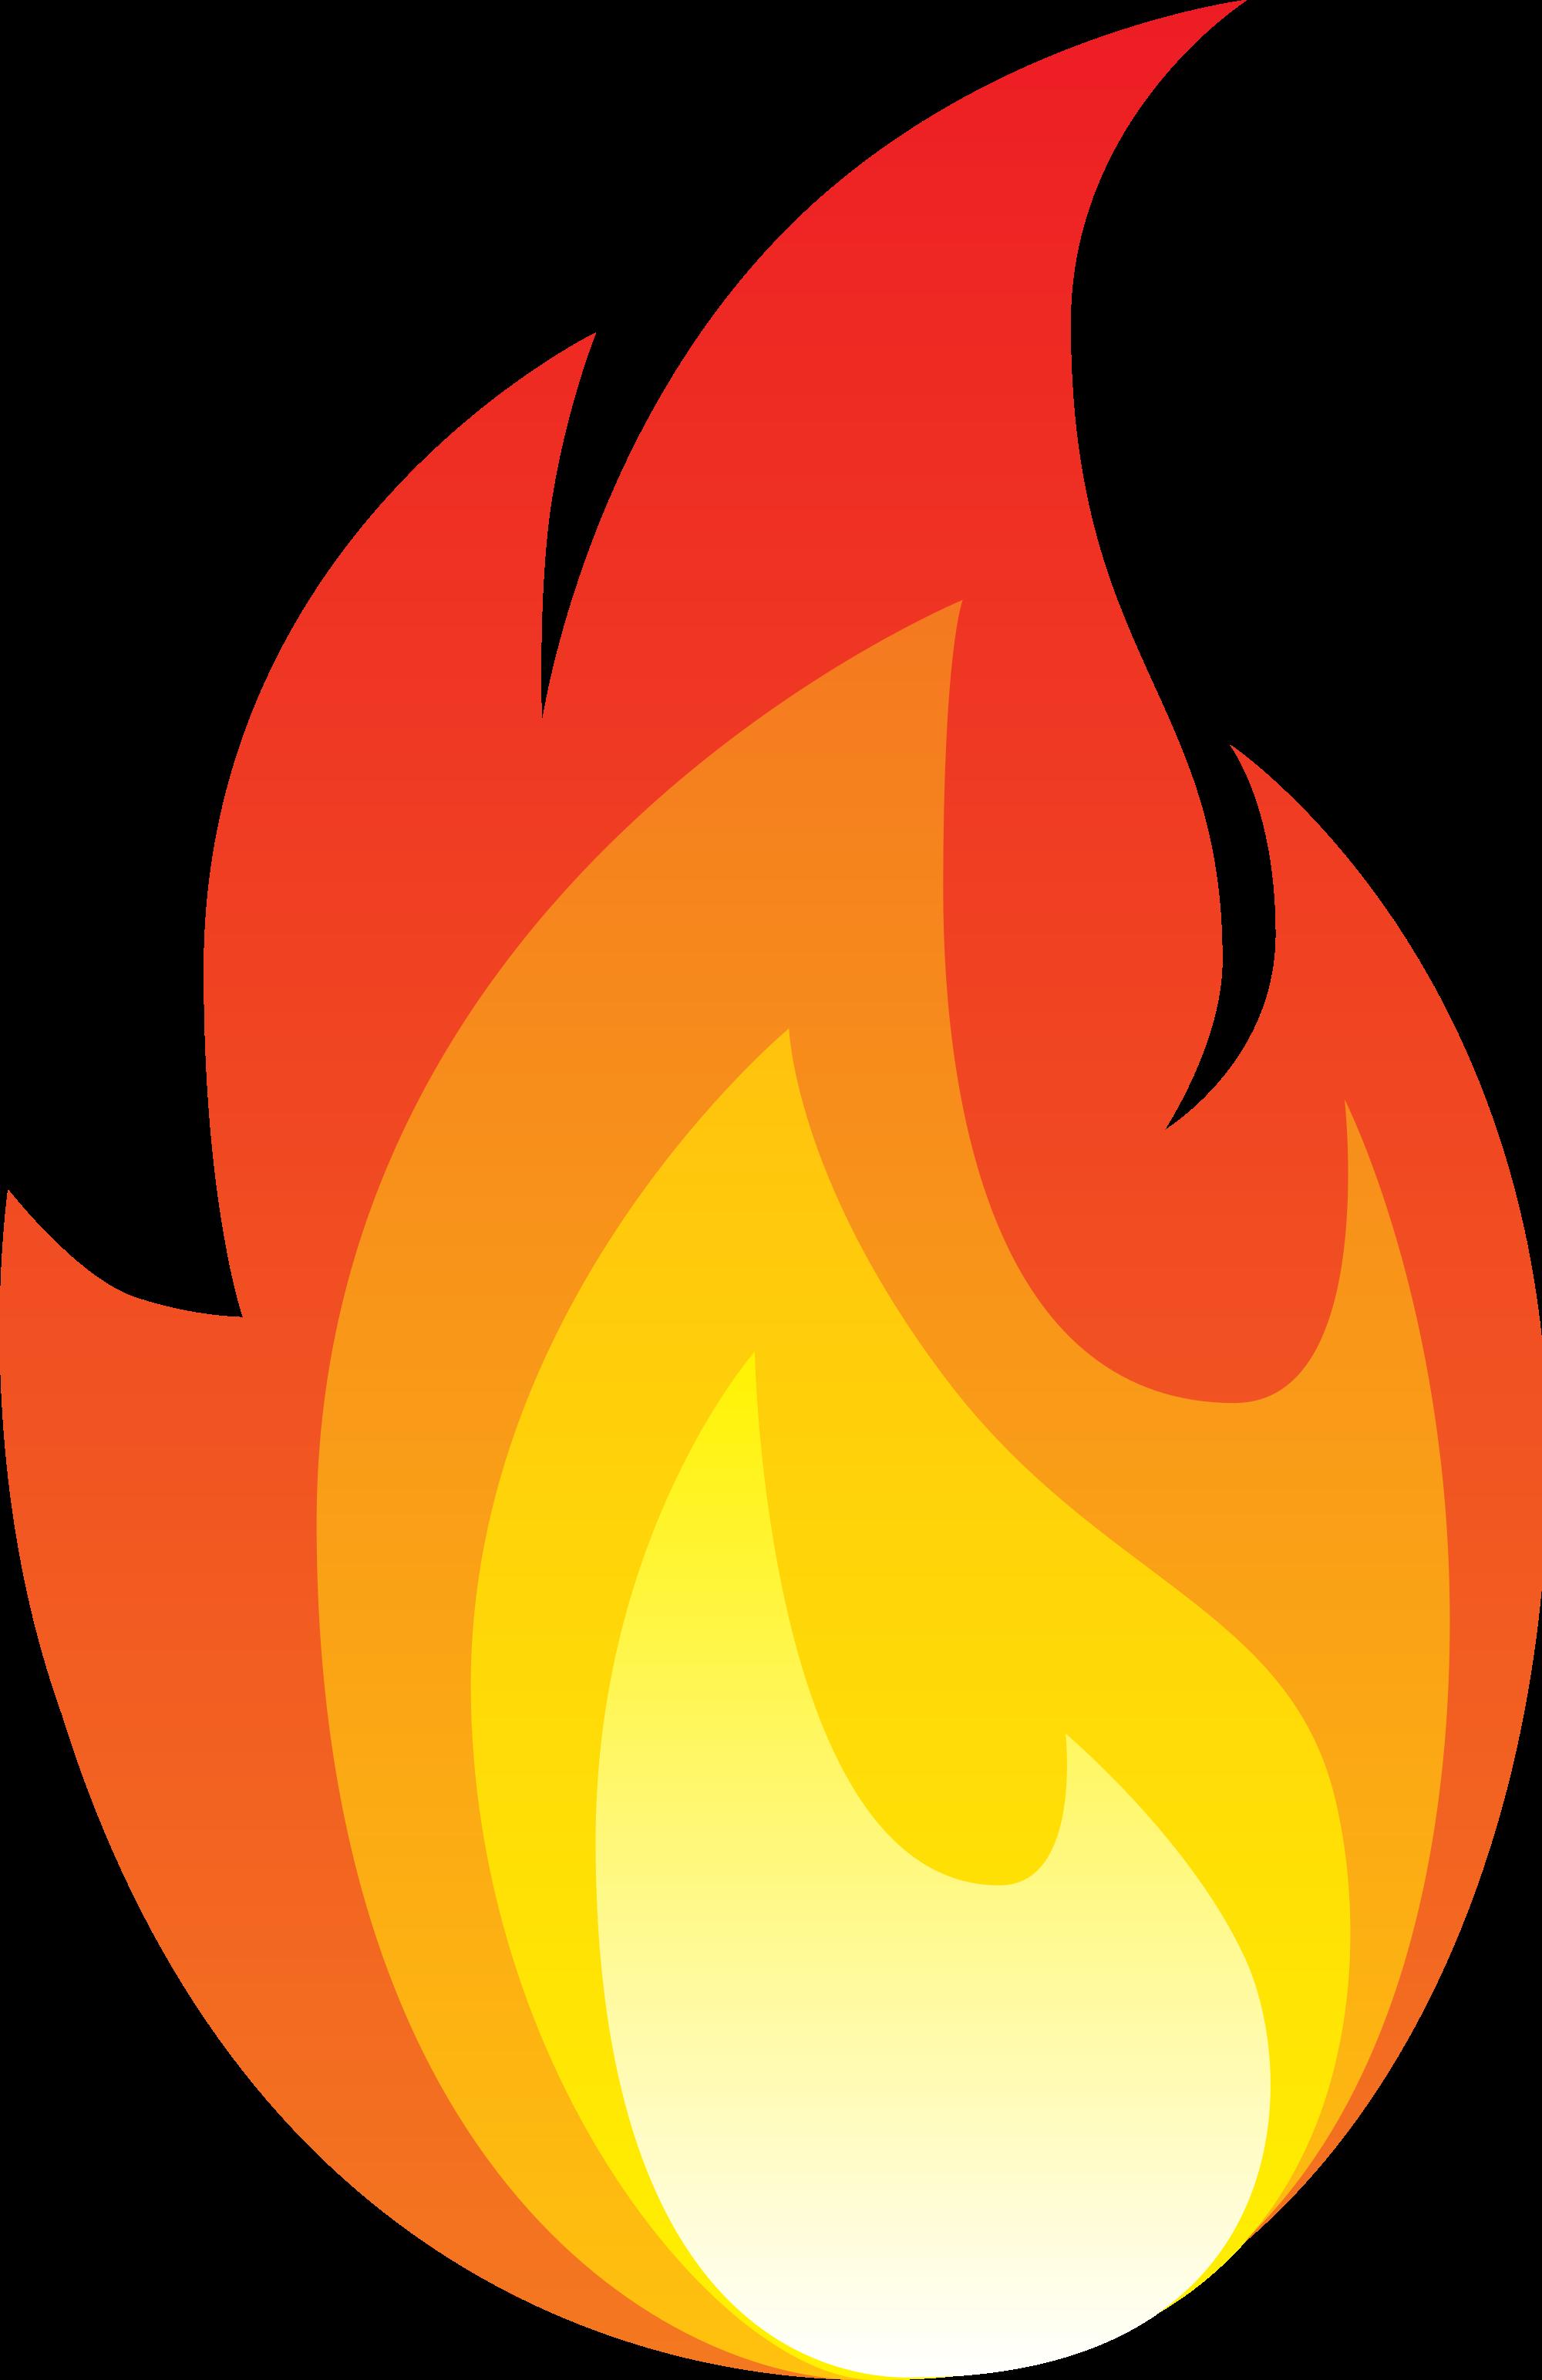 Clipart Flames Svg Clipart Flames Svg Transparent Free For Download On Webstockreview 2021